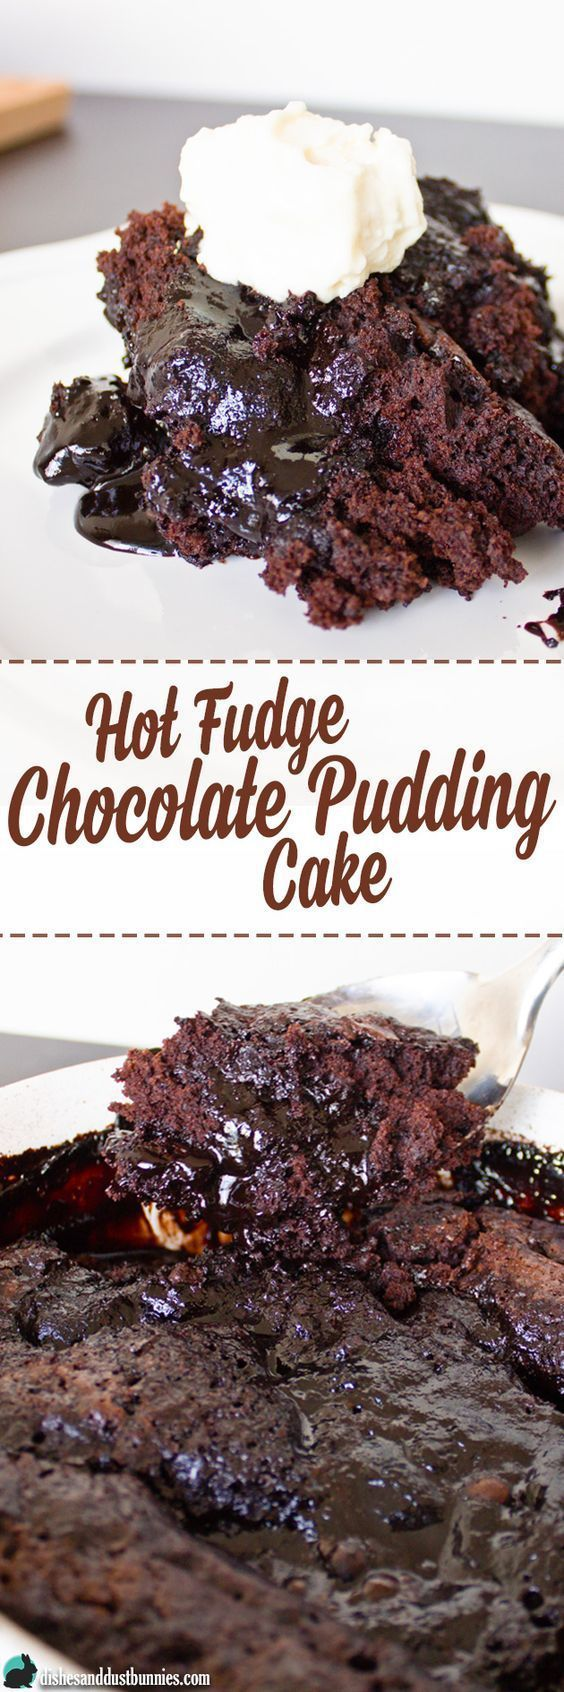 Hot Fudge Chocolate Pudding Cake from dishesanddustbunnies.com